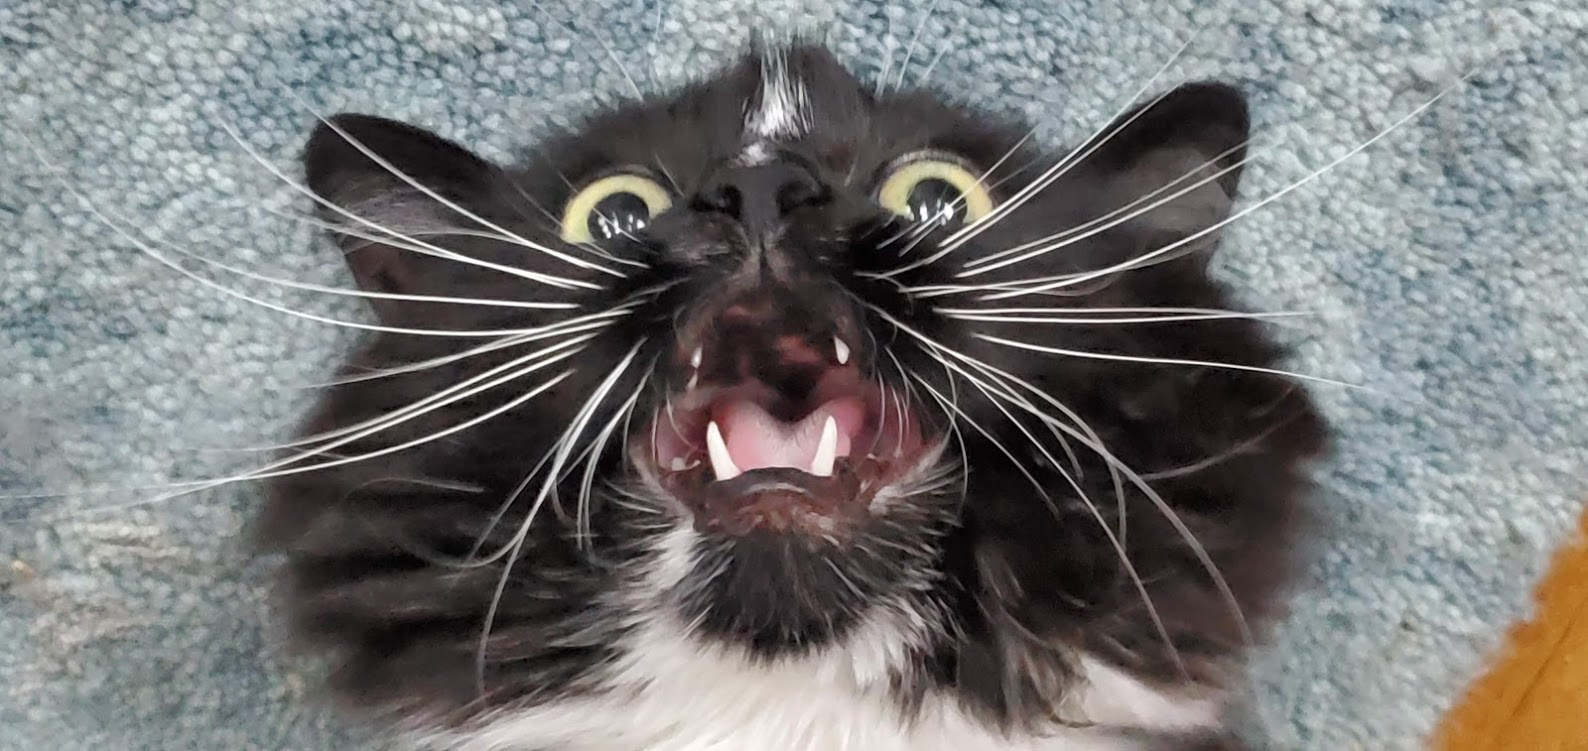 vicous cat